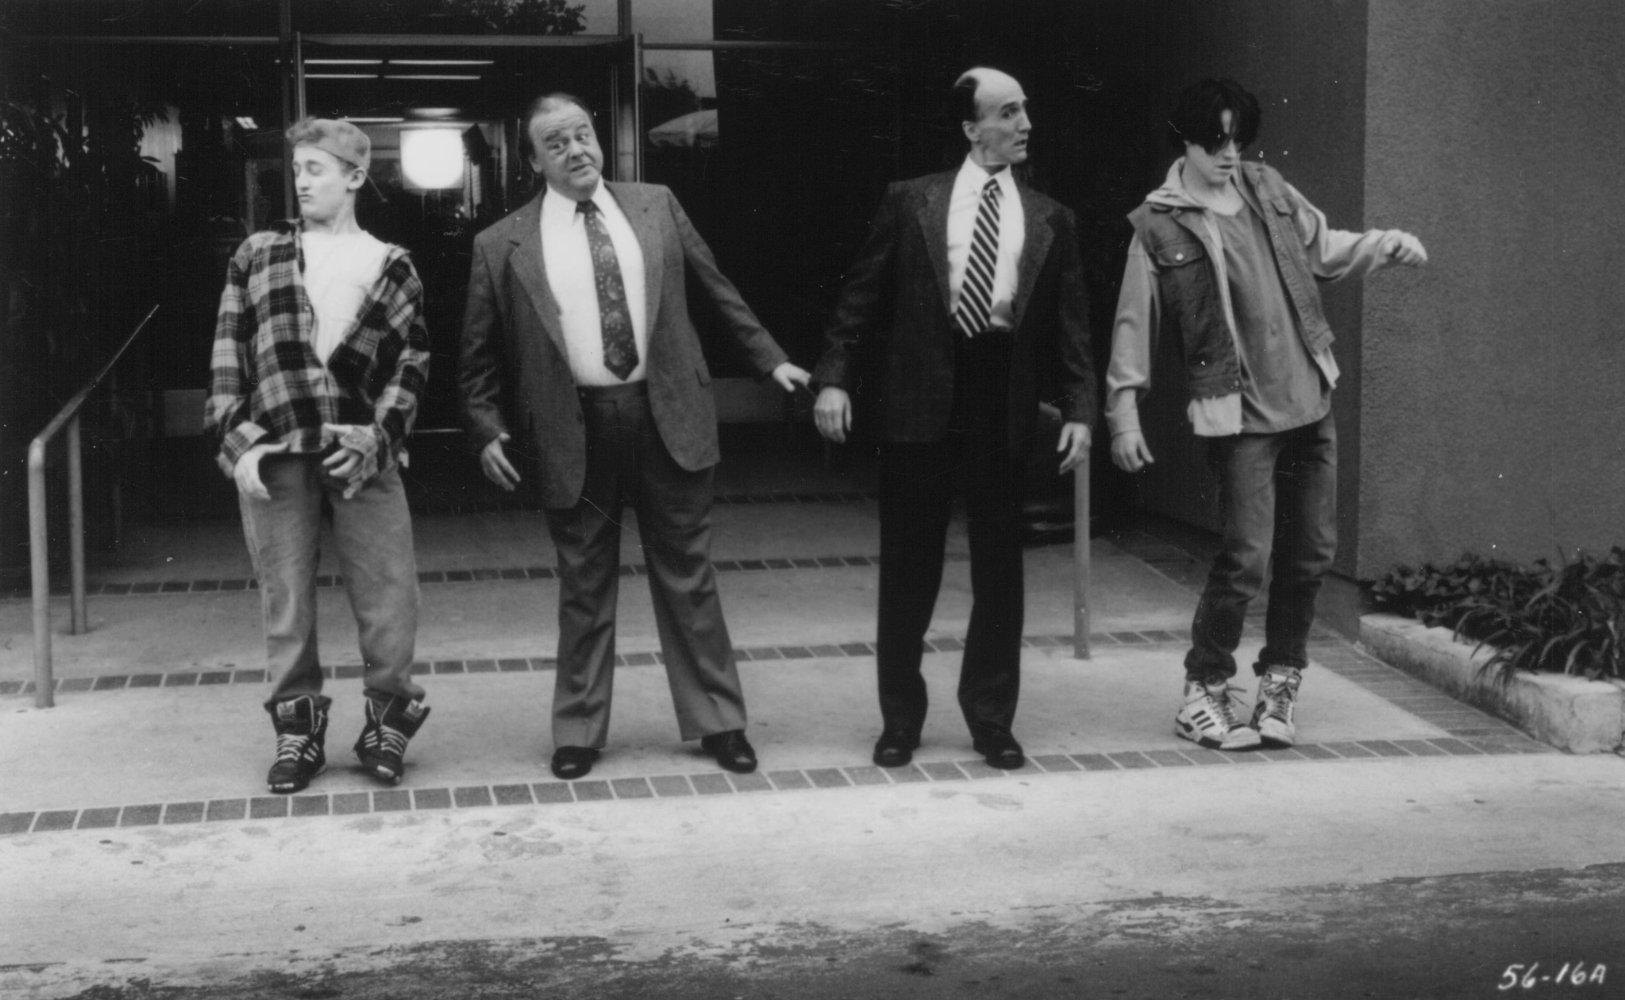 Bill & Teds Bogus Journey